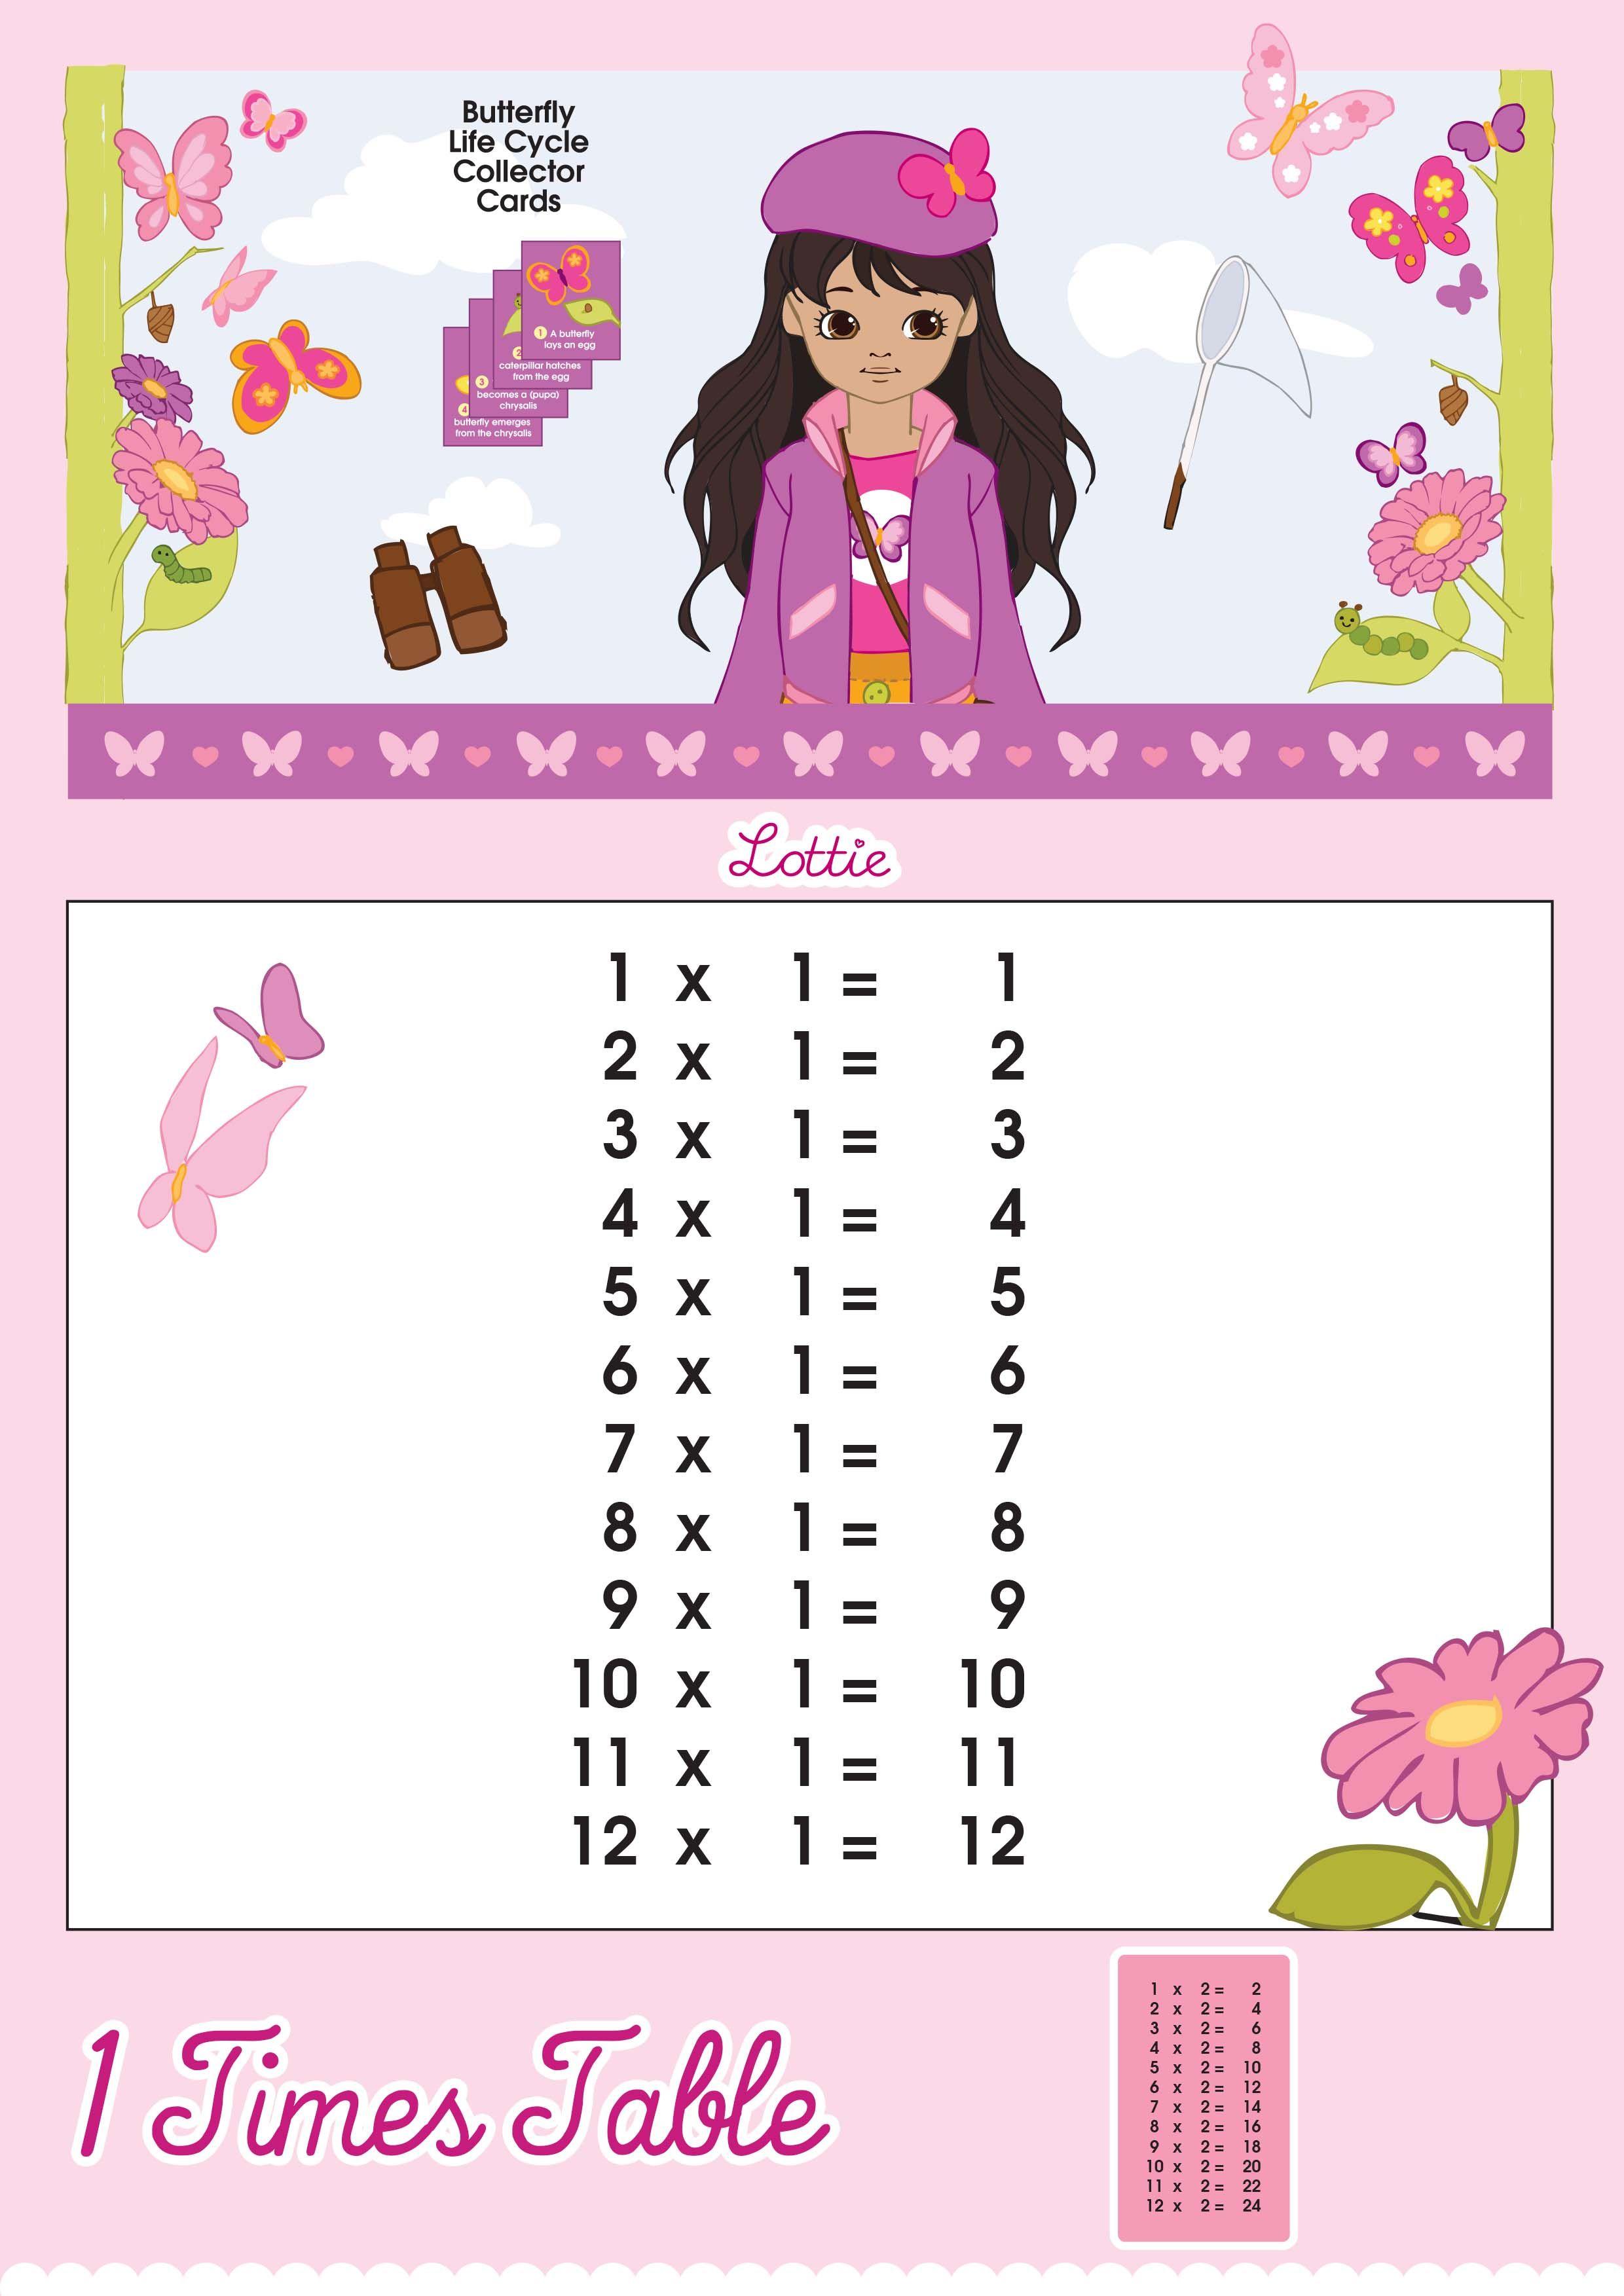 1 times table printable chart multiplication table printable 1 times table printable chart gamestrikefo Choice Image